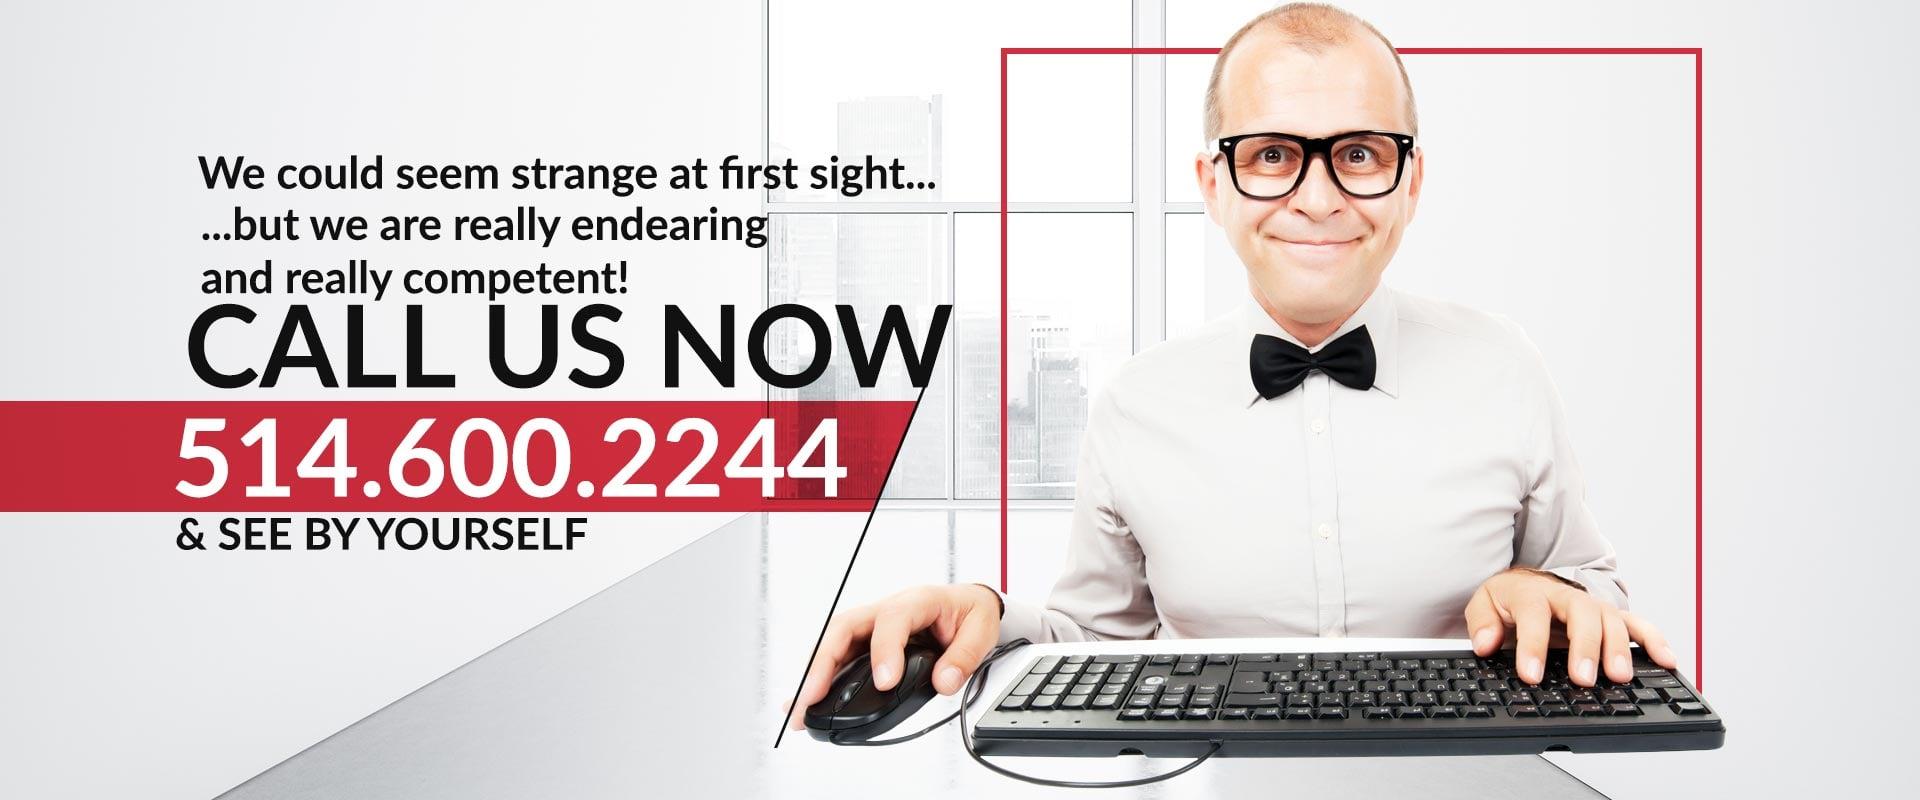 fute marketing web strategy agency laurentians seo contact 920x800 002 - Website Positioning - Futé Marketing